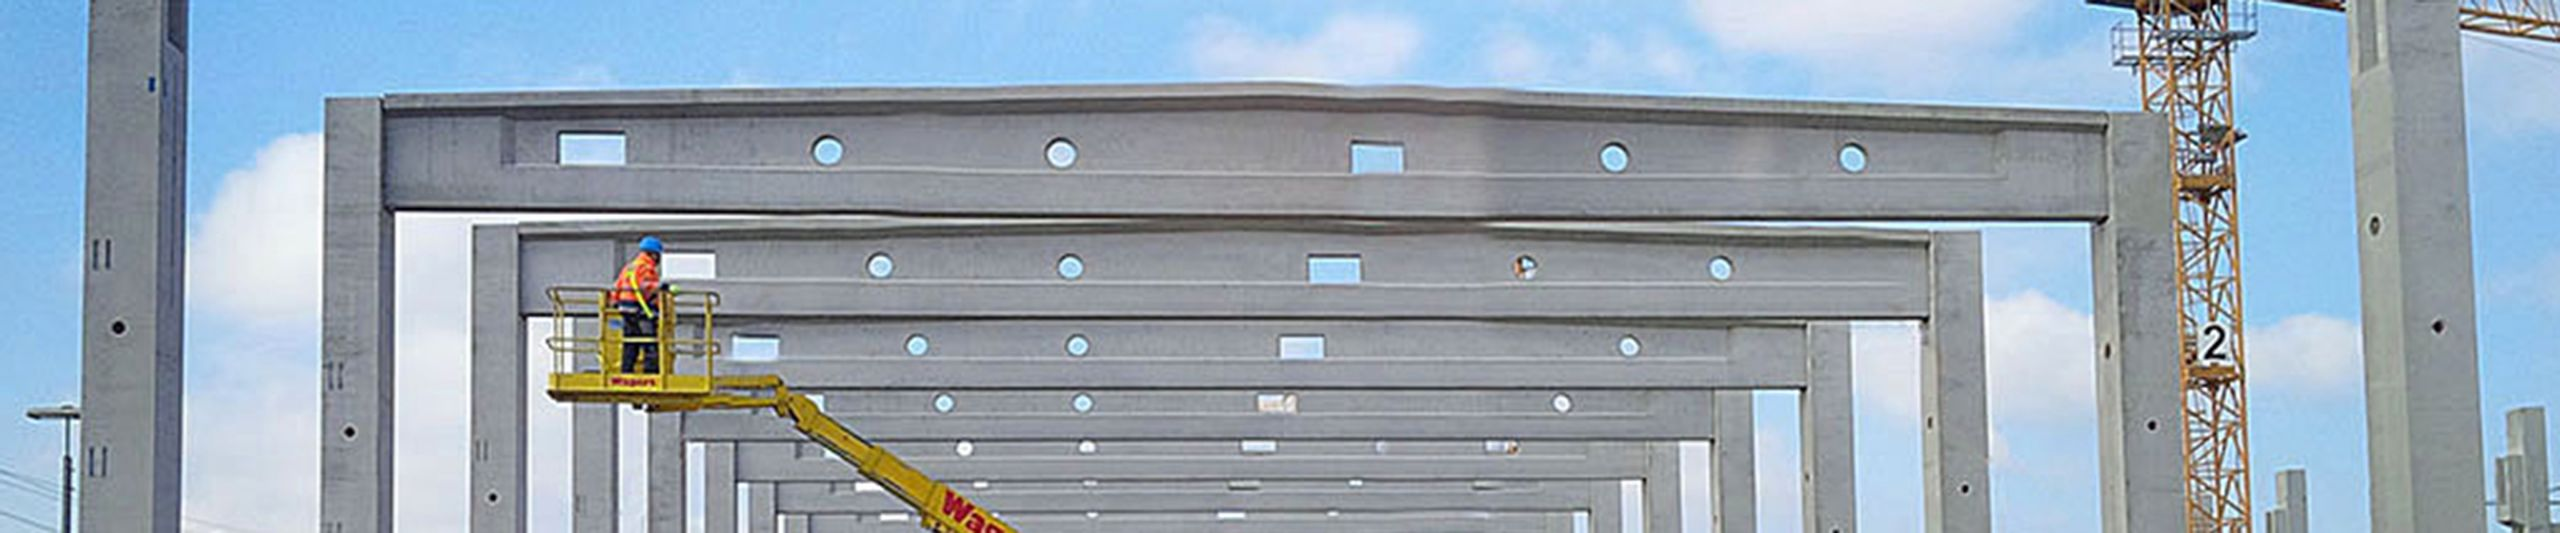 Prestressed concrete for TT ceilings, girders, car park ceilings